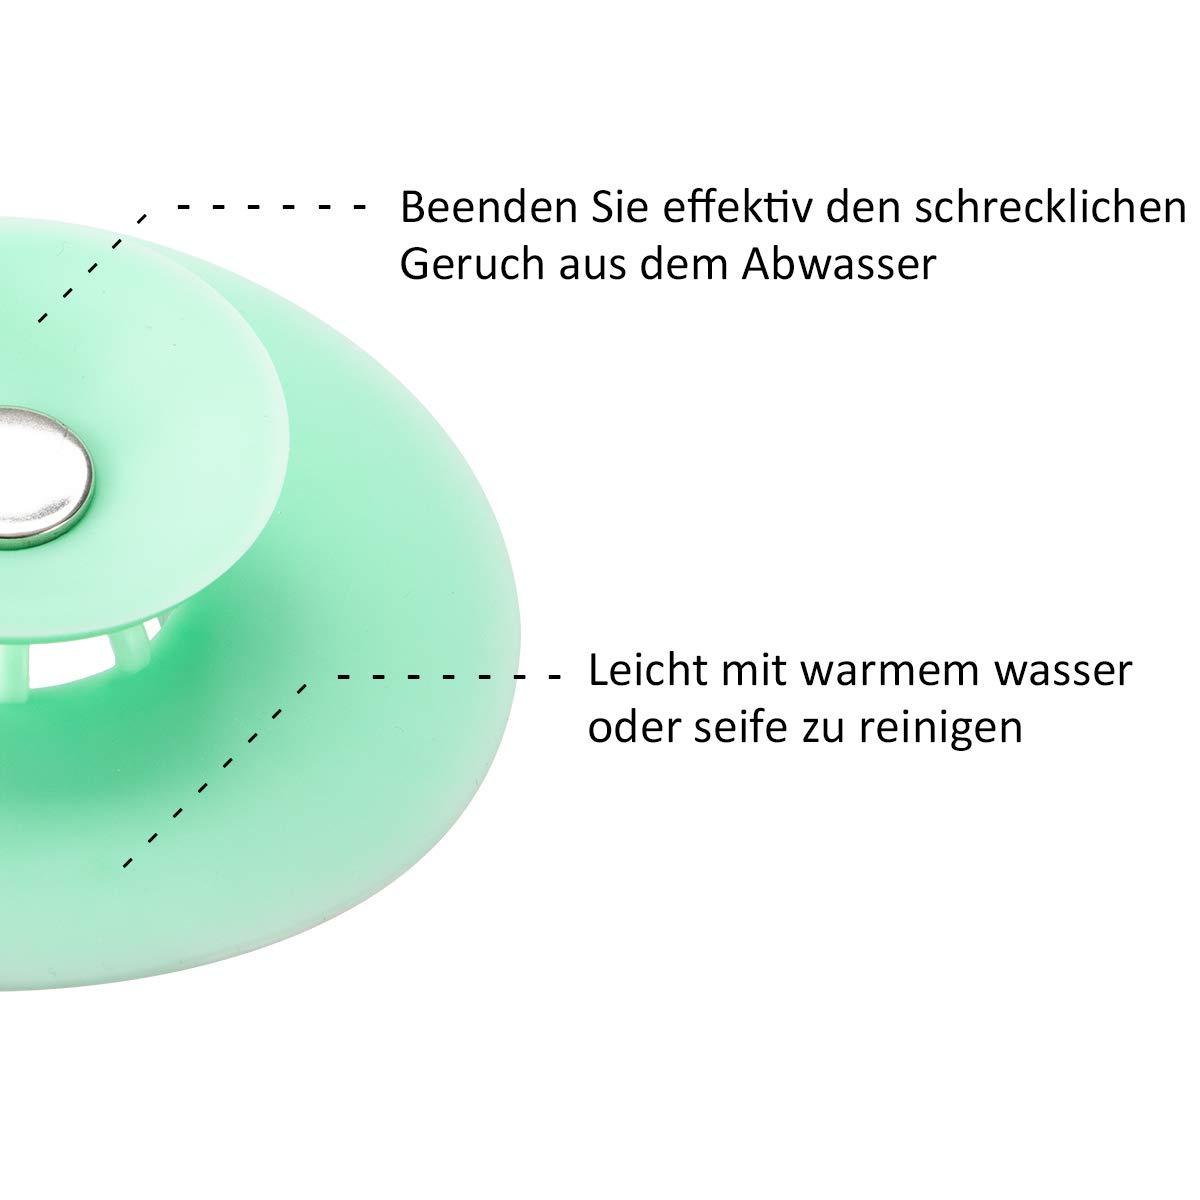 Abfluss St/öpsel f/ür Badewanne 2 in 1, 4 Farben Bodenabl/äufe Haarsieb K/üchensp/ülen Waschbeckenst/öpsel,Badewannenst/öpsel PAMASE 4 St/ück Abflussstopfen Abflusssieb